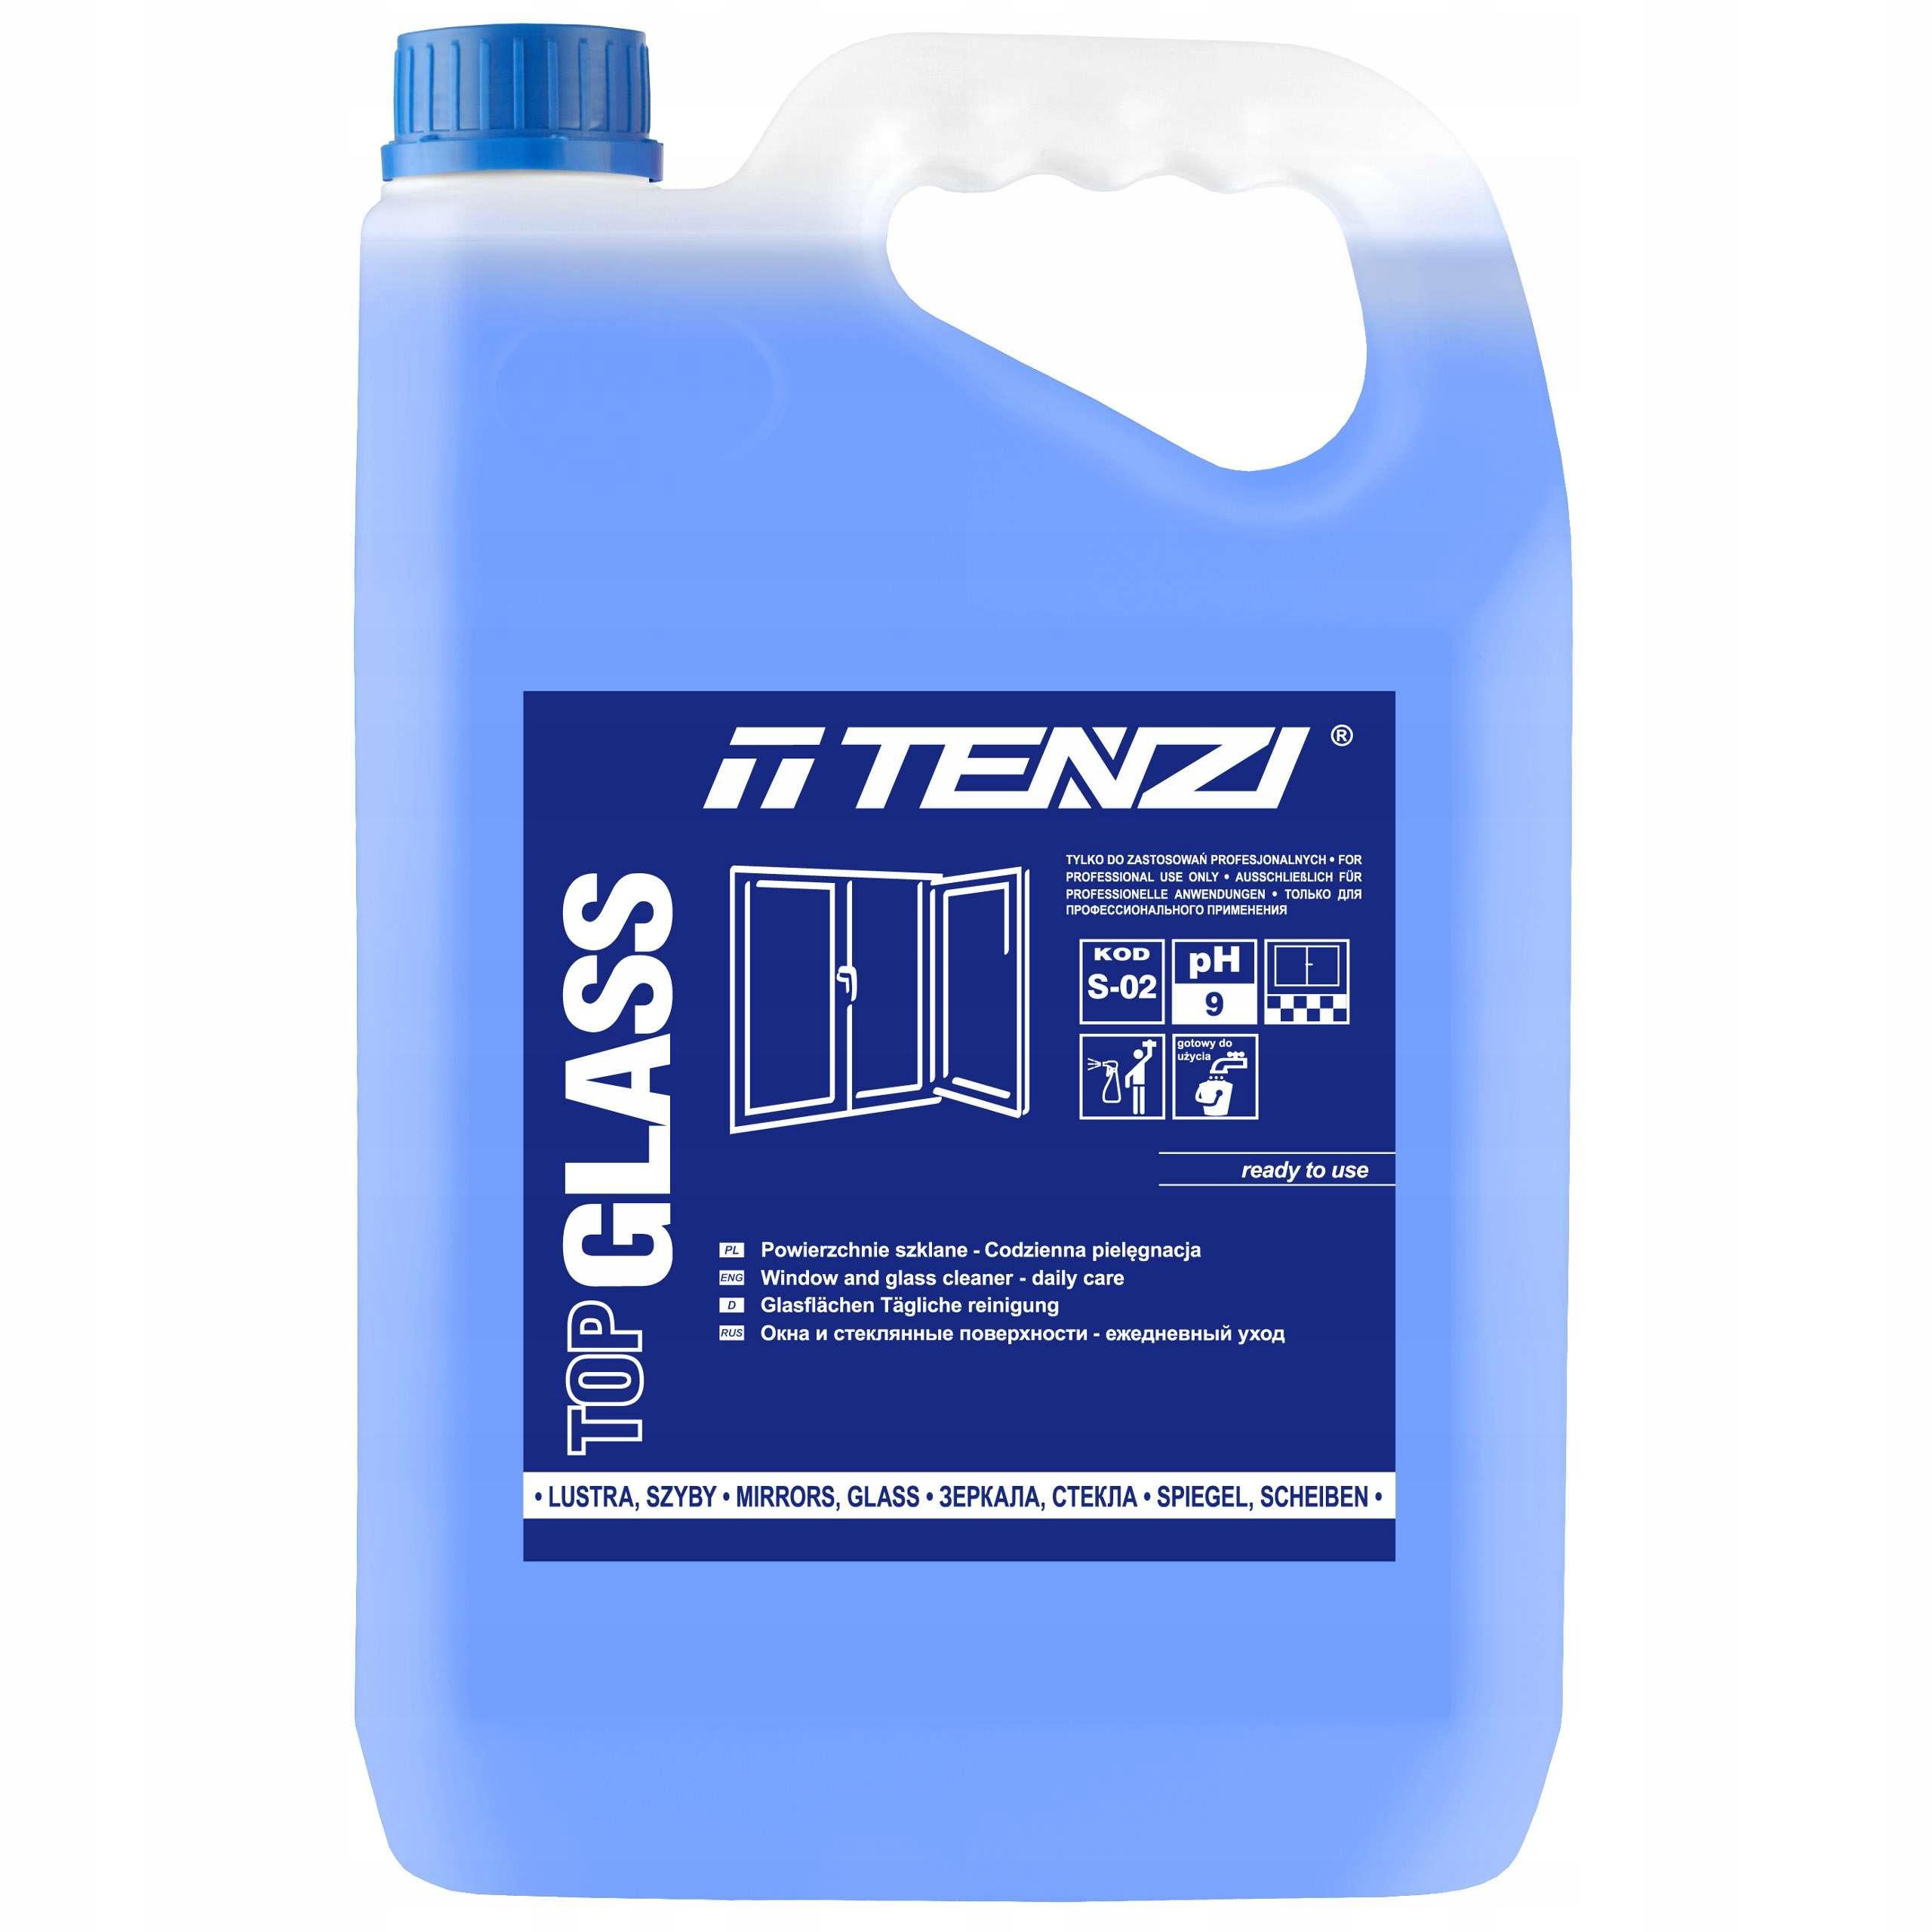 Tenzi Топ Стекло 5L Стекло Стекло Стиральная жидкость